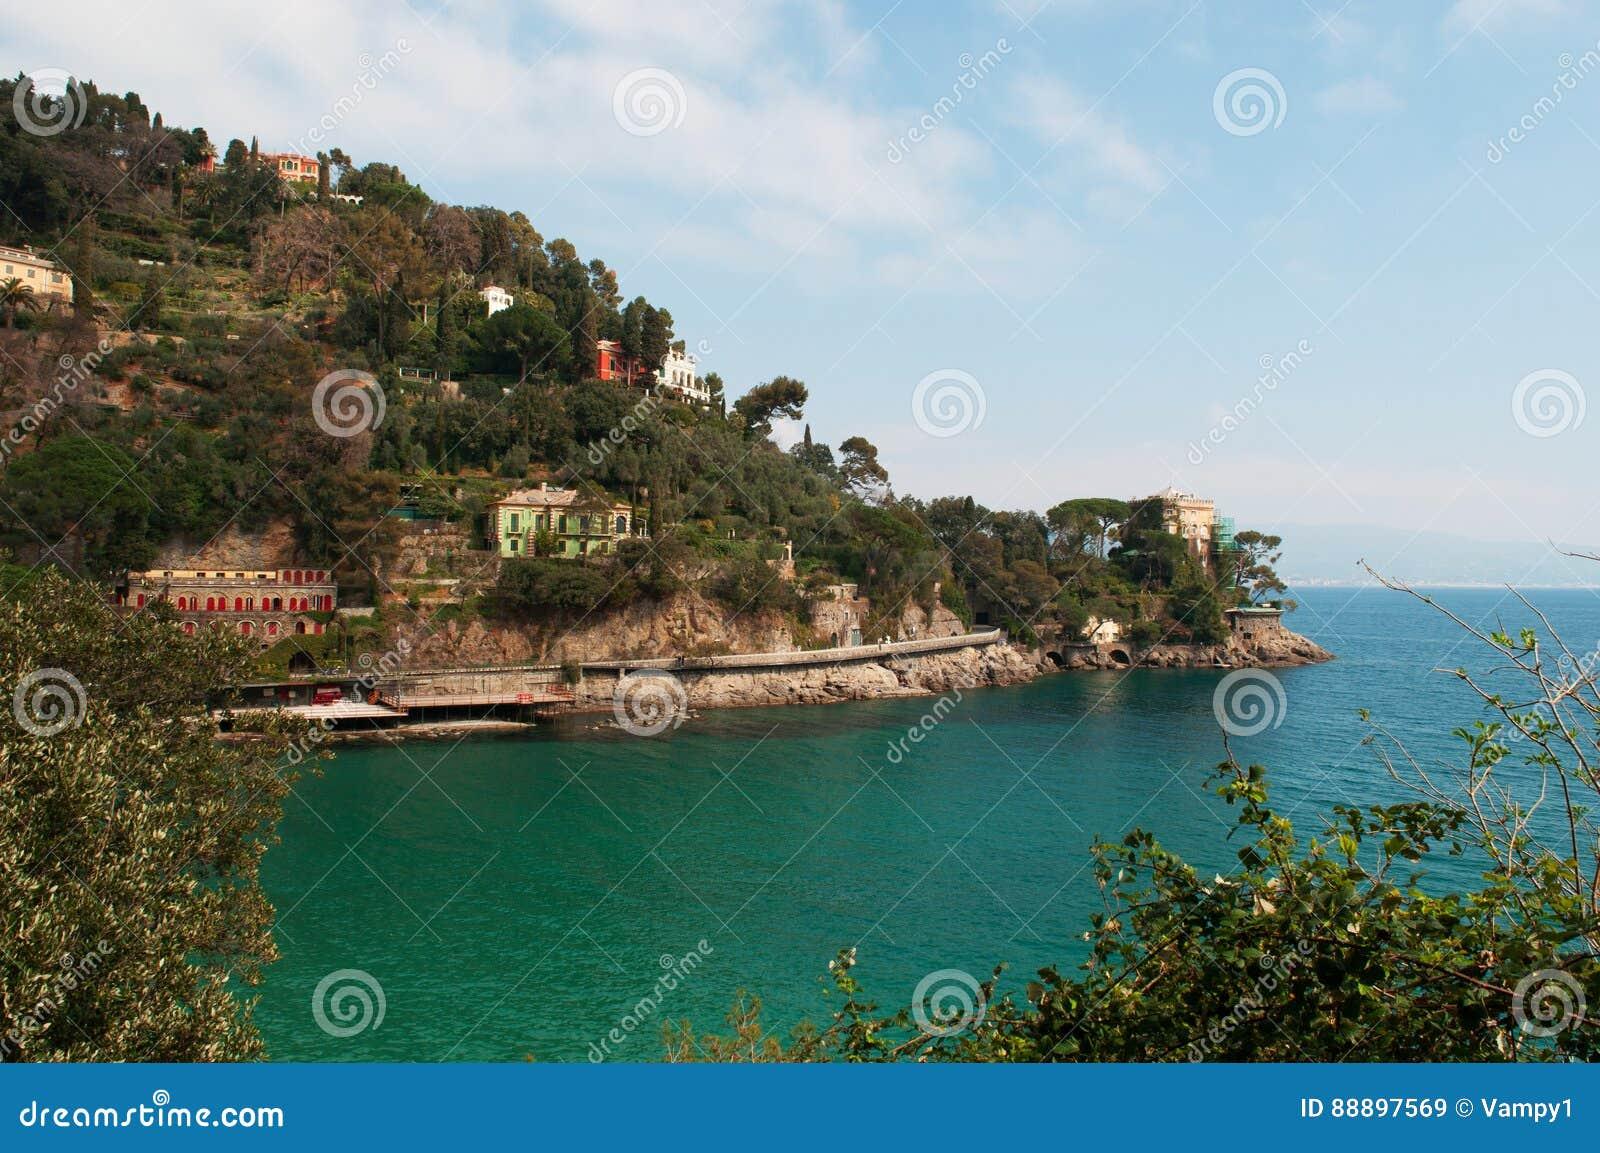 Paraggi,热那亚,利古里亚,意大利,意大利语里维埃拉,欧洲